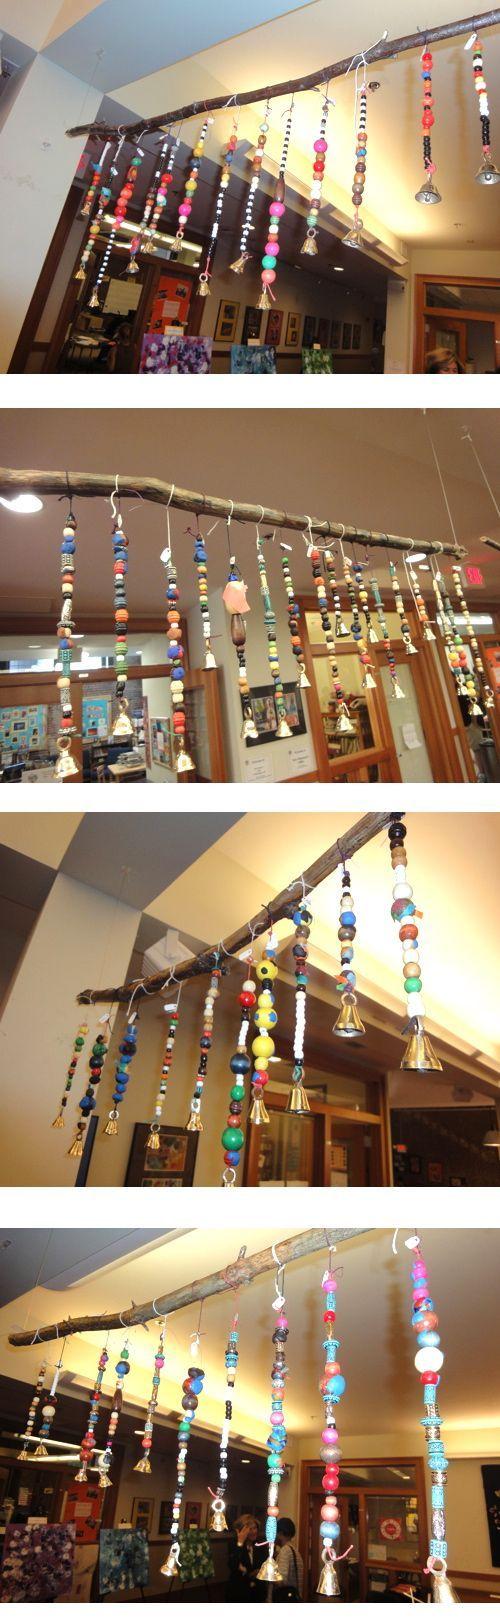 Reggio Classroom Decor Ideas : Pinterest the world s catalog of ideas